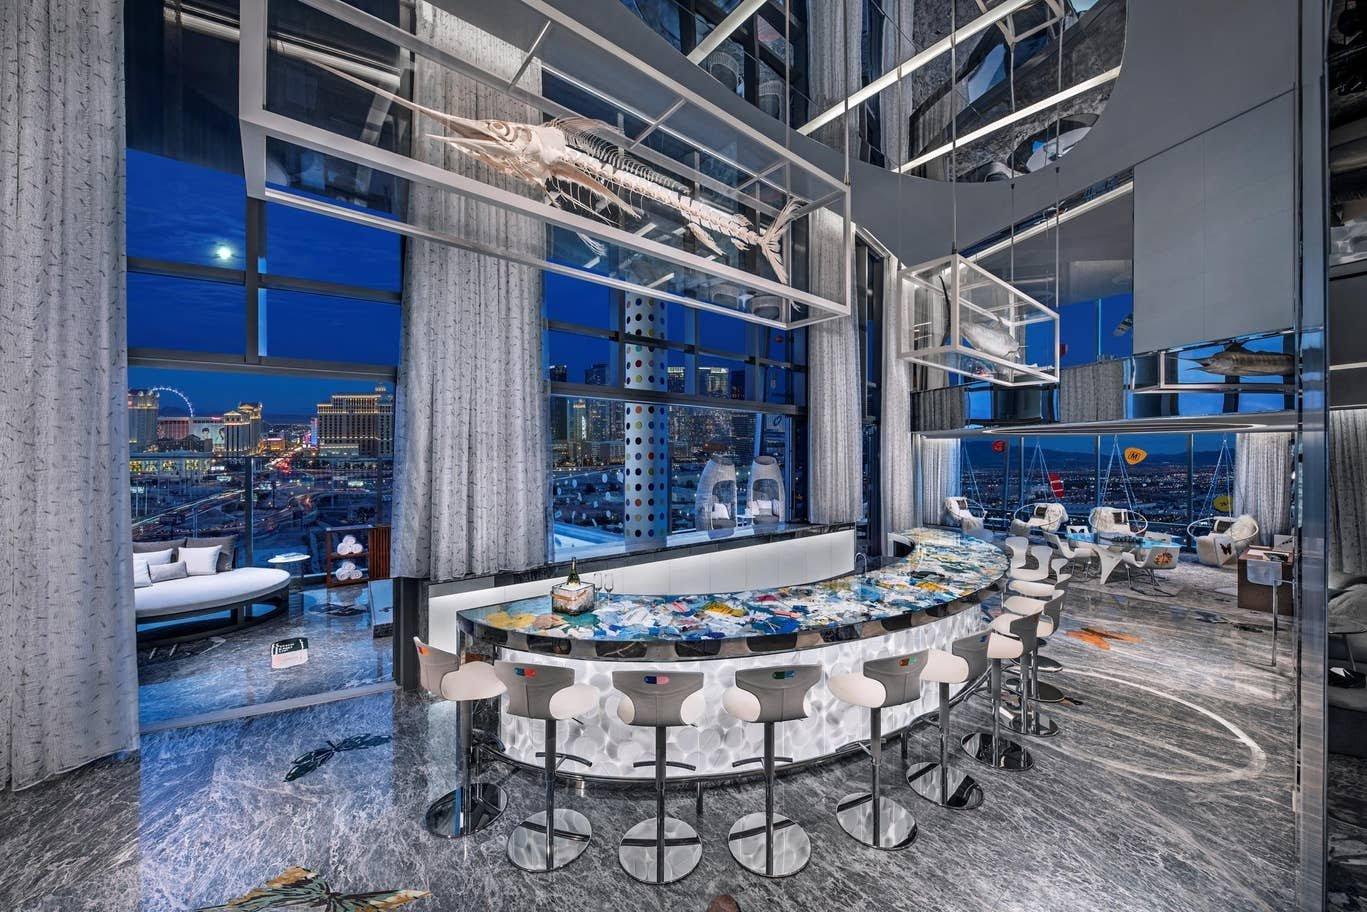 Världens dyraste hotellrum - Palms Las Vegas